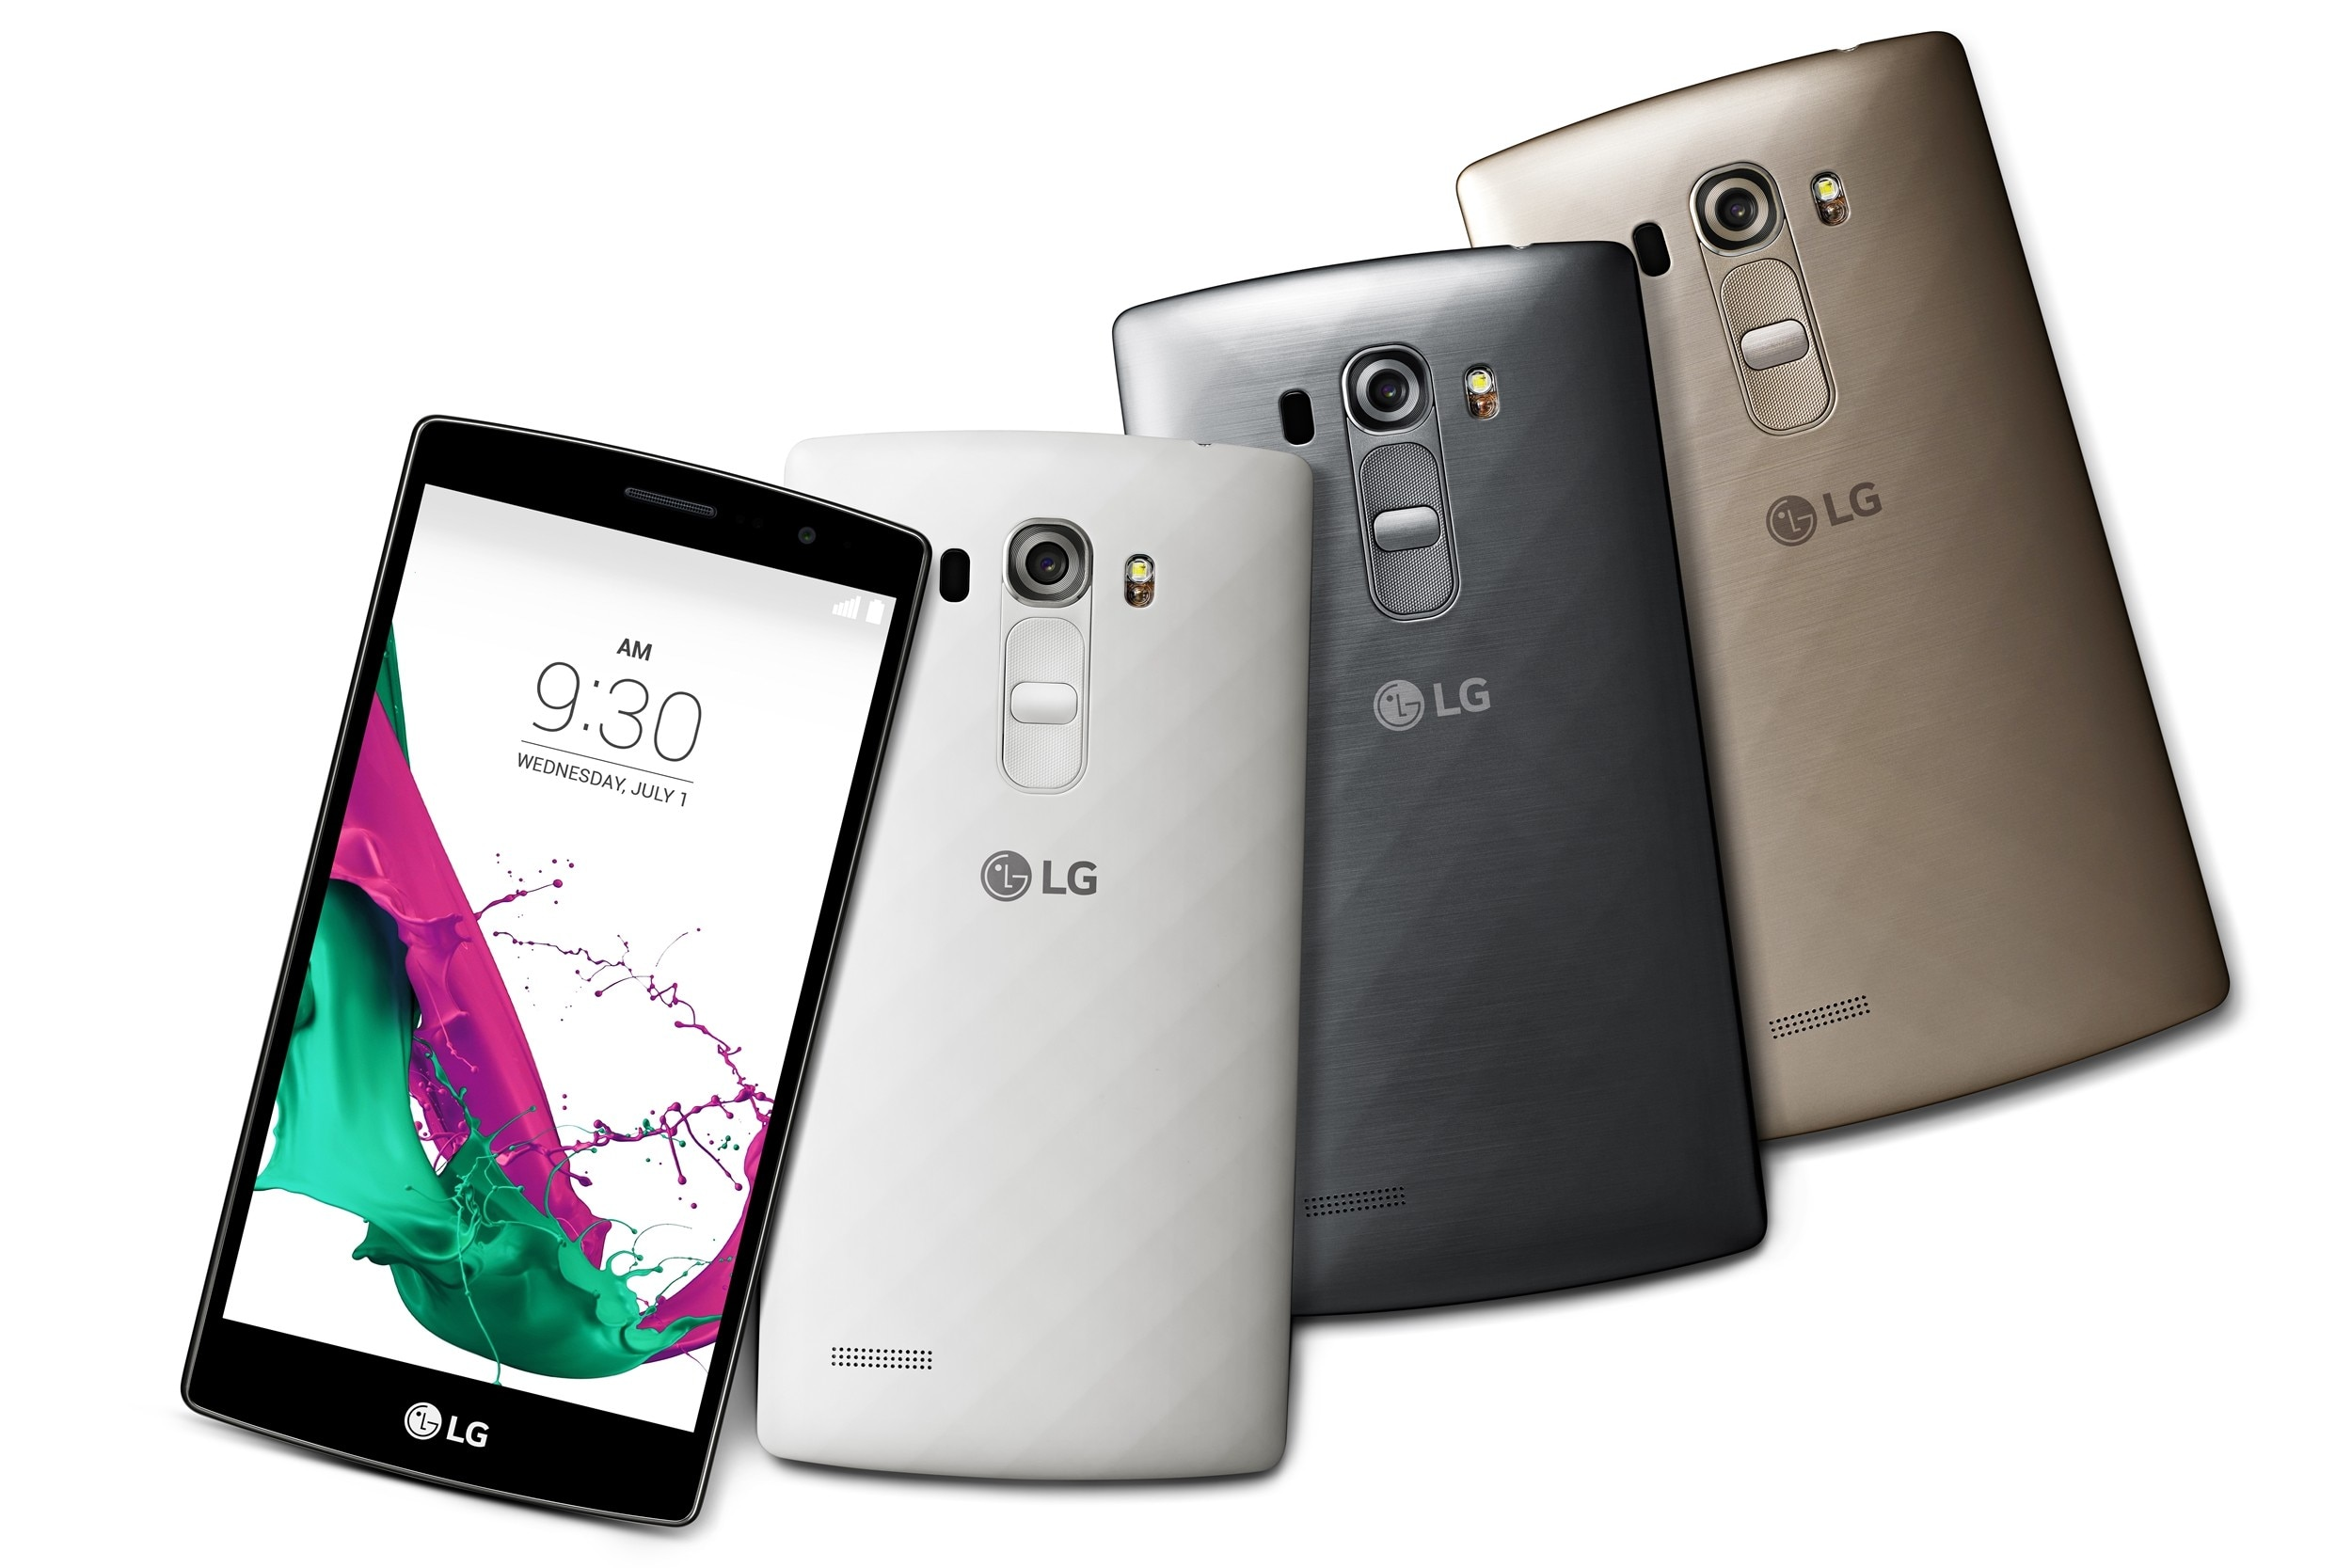 LG G4s render – 1